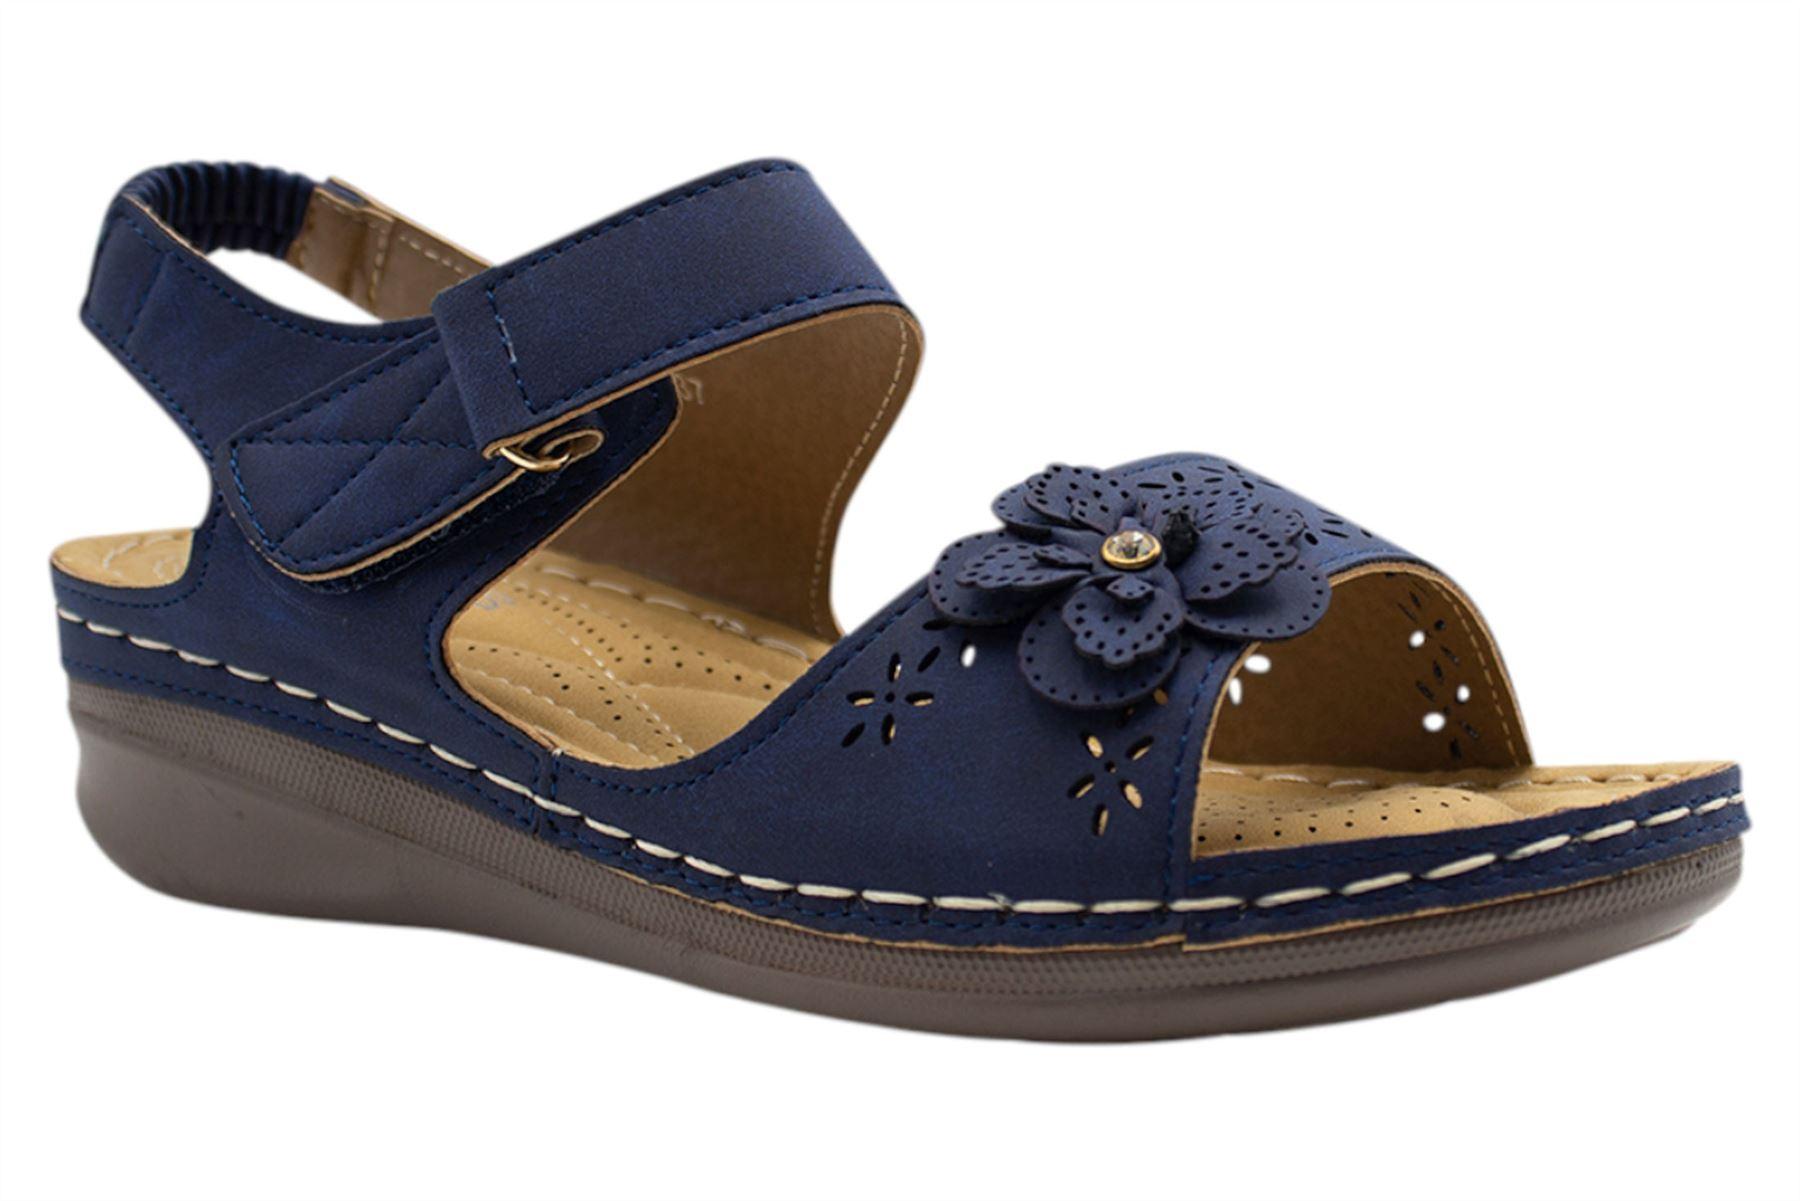 Ladies-Sandals-Womens-Mid-Heel-Comfort-Summer-Beach-Casual-Wear miniatura 31